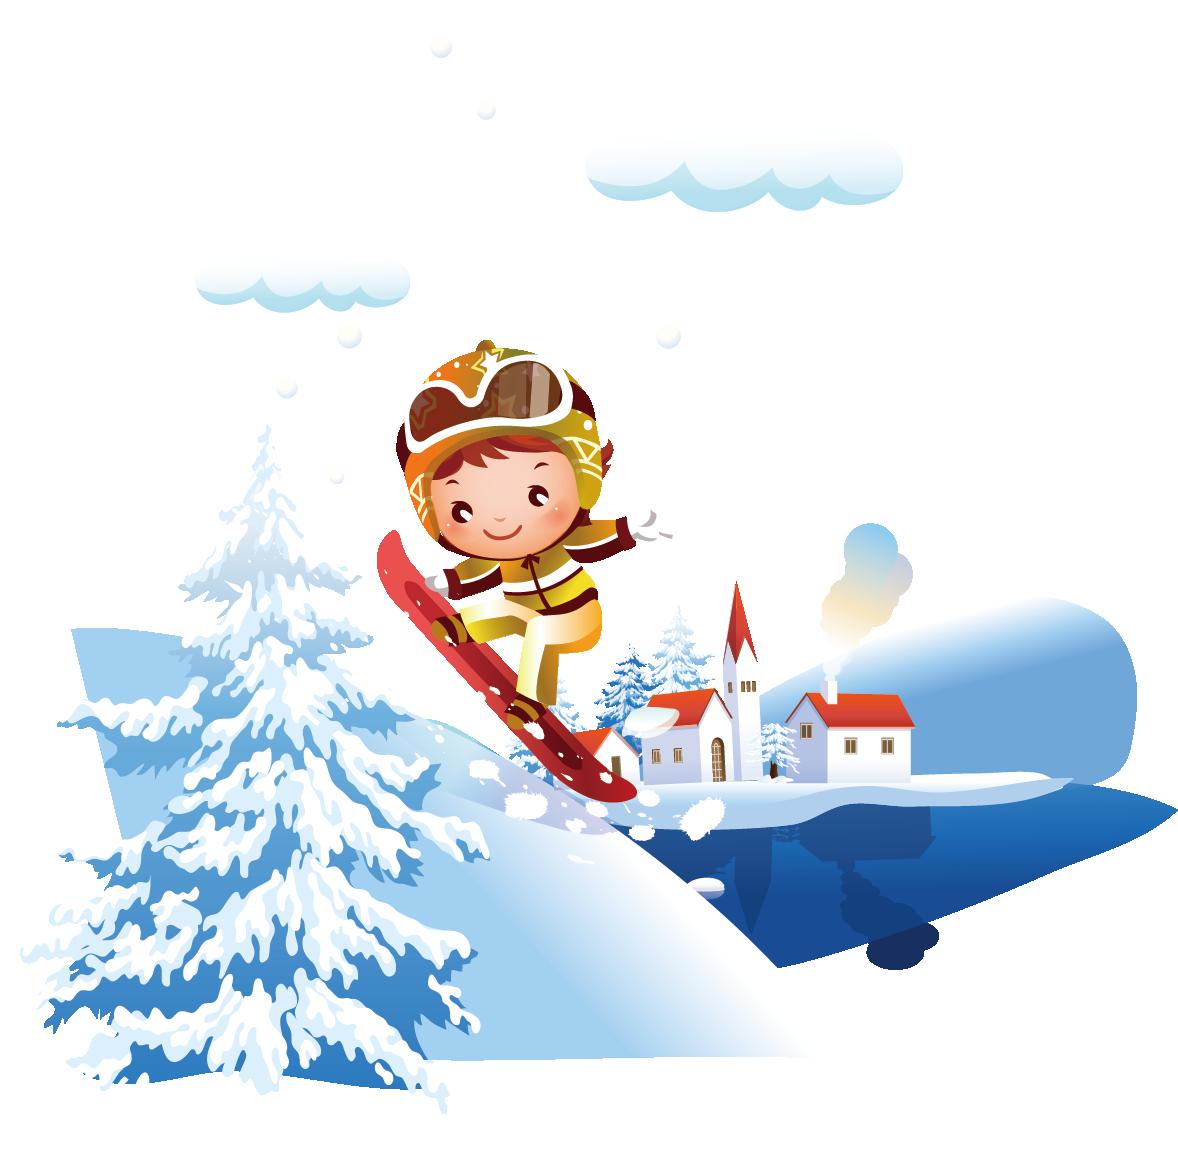 Pomegranate clipart winter. Skiing cartoon illustration snow